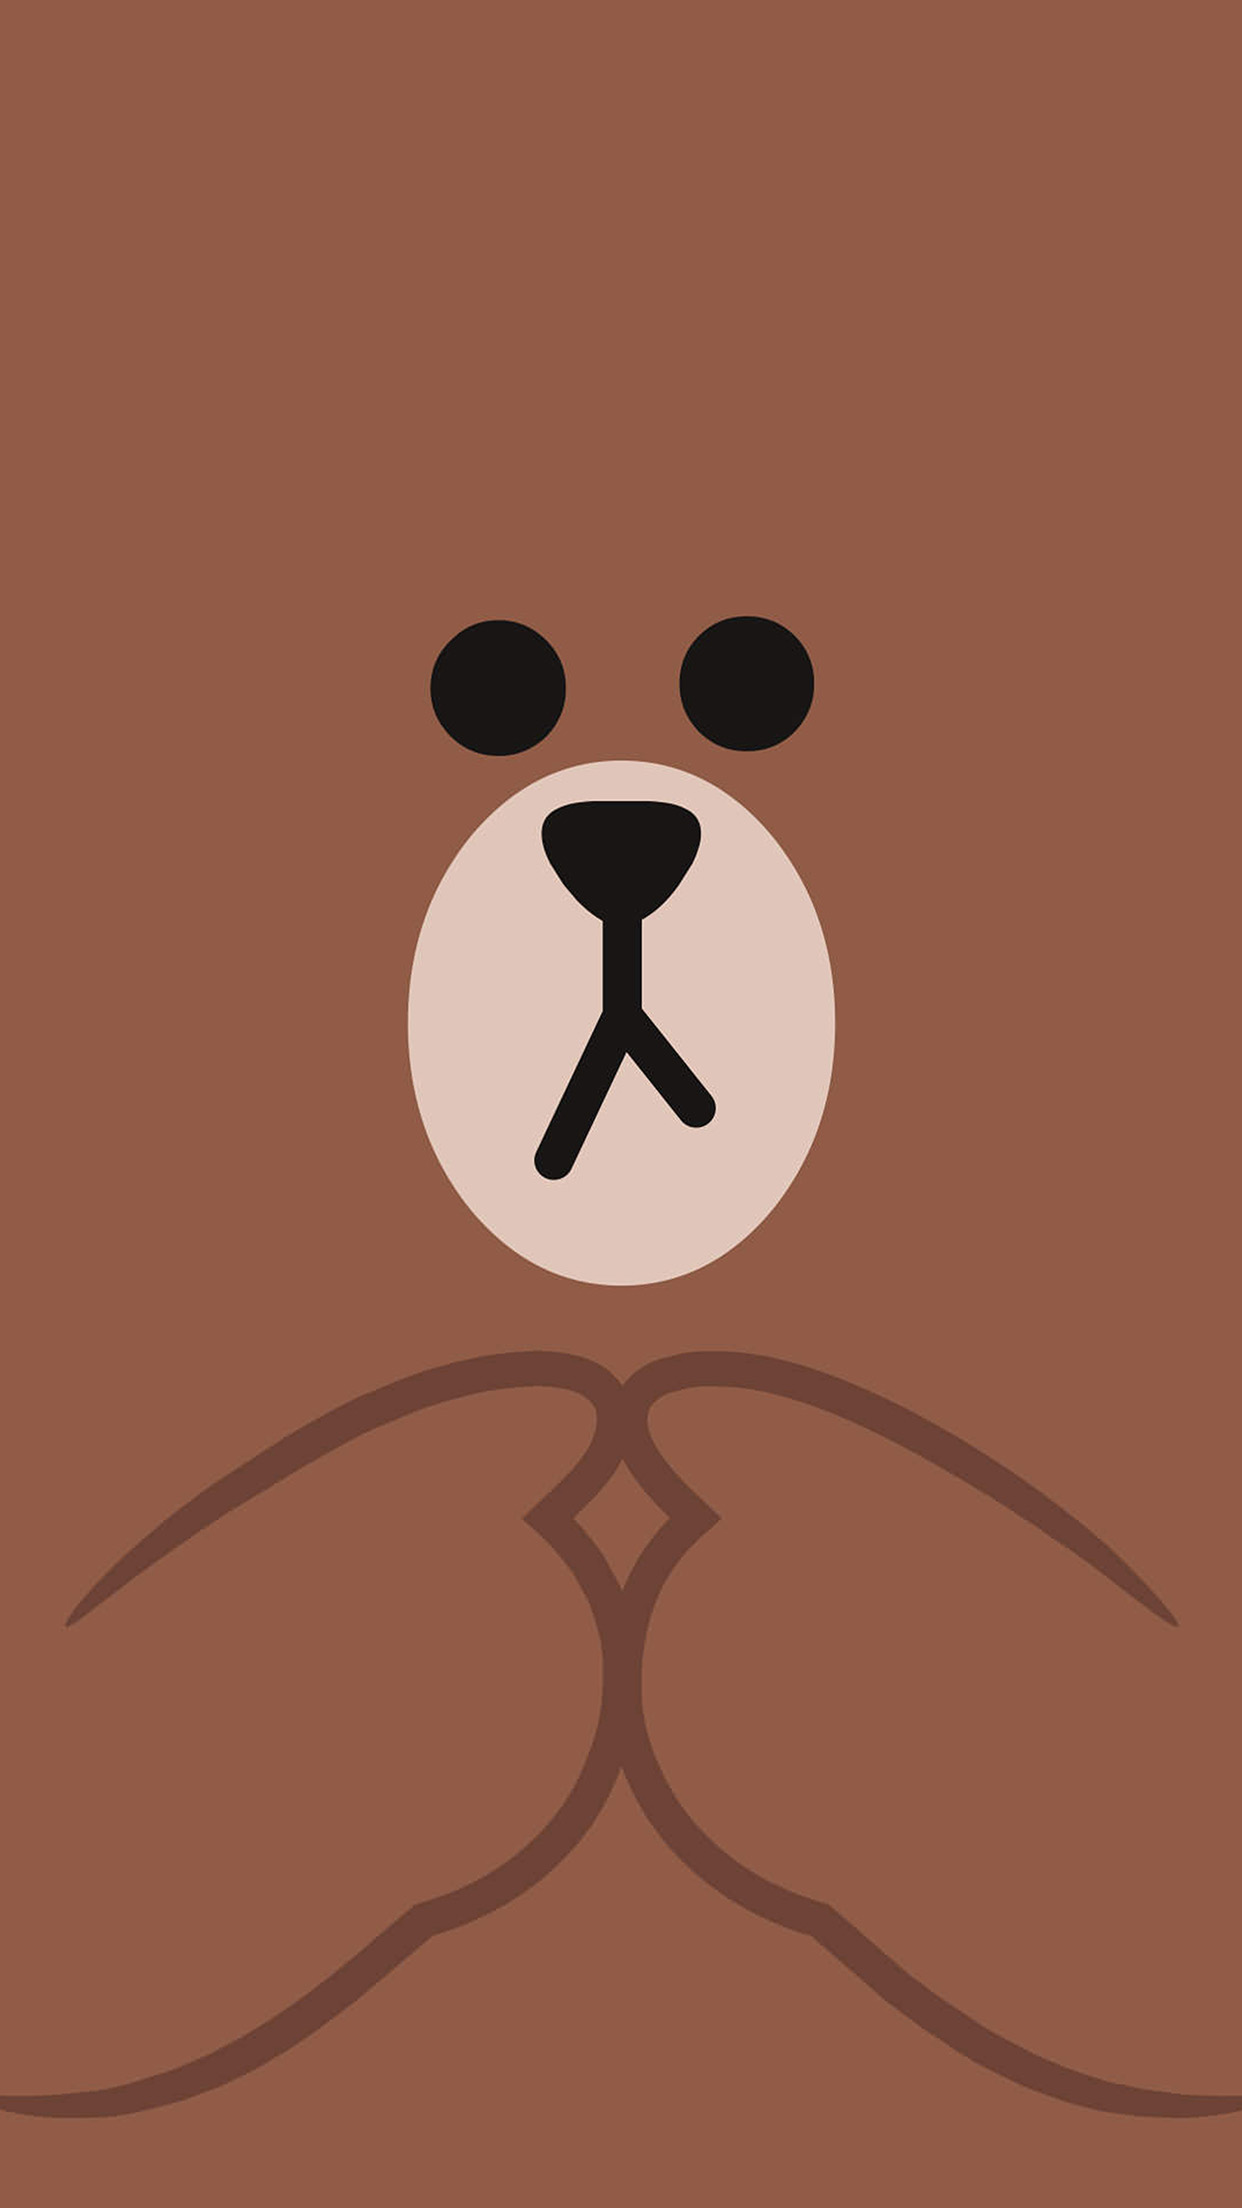 cute bear cartoon wallpaper | adsleaf